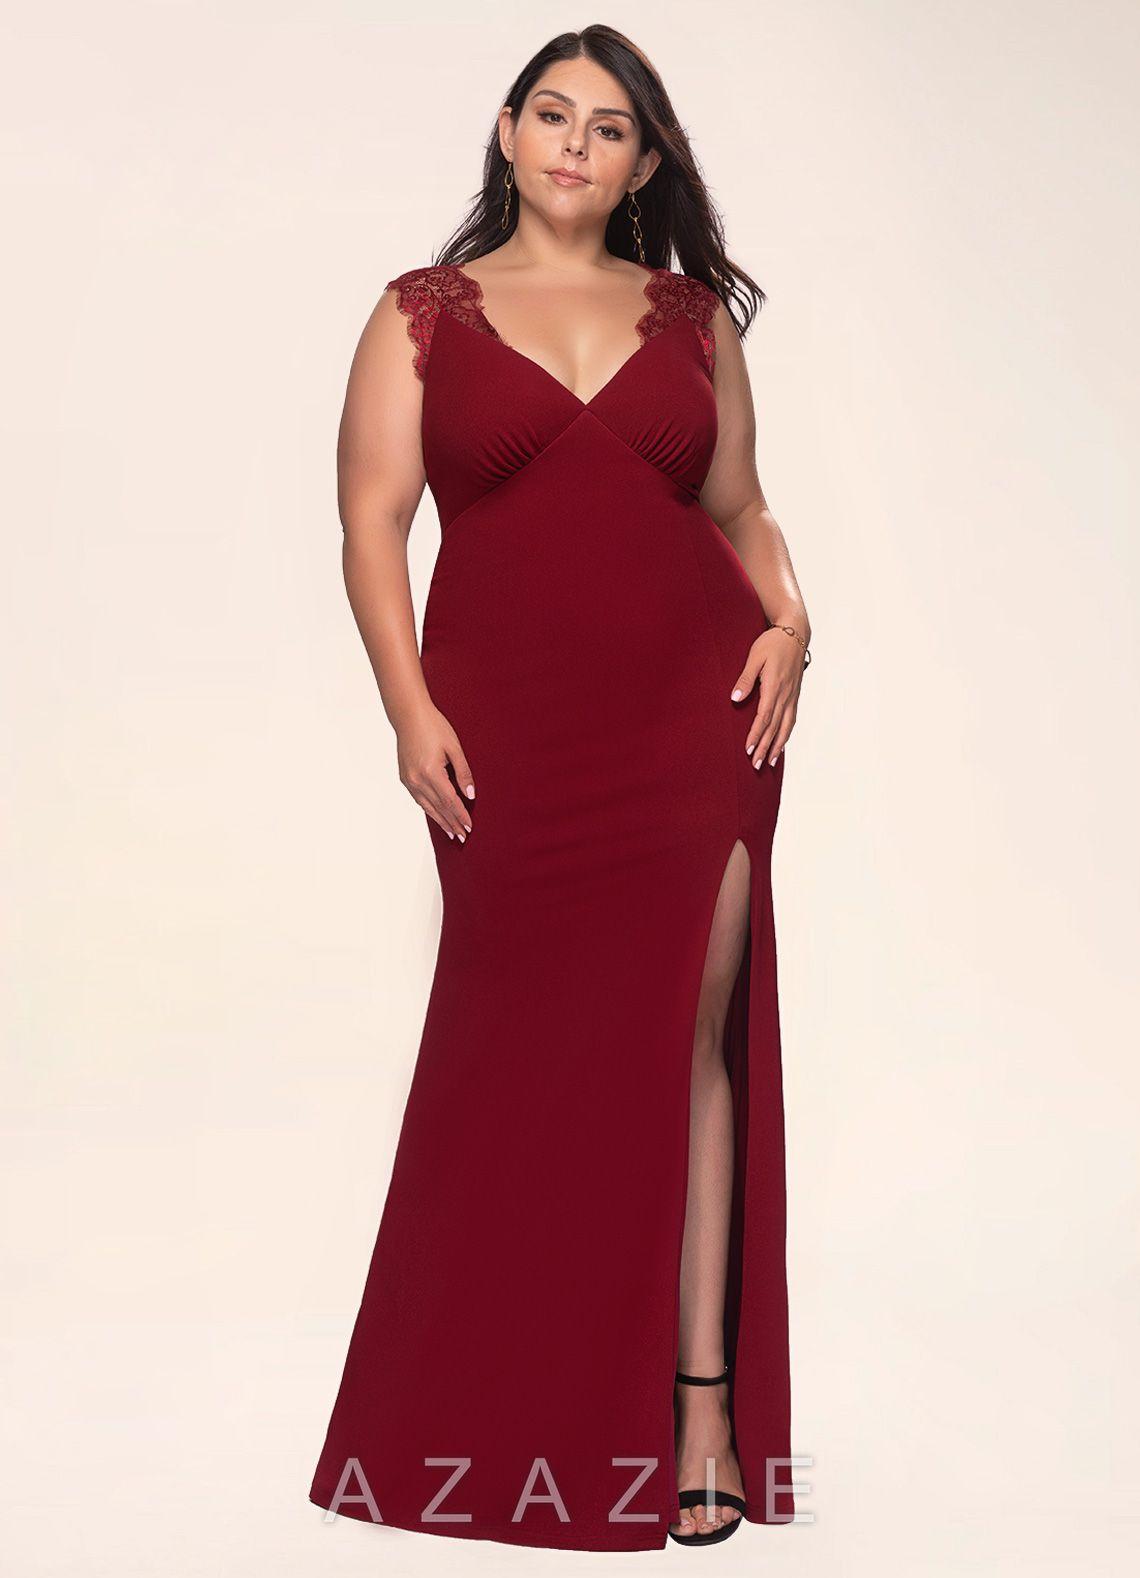 Elegant Love Burgundy Stretch Crepe Maxi Plus Dress Dress | Azazie